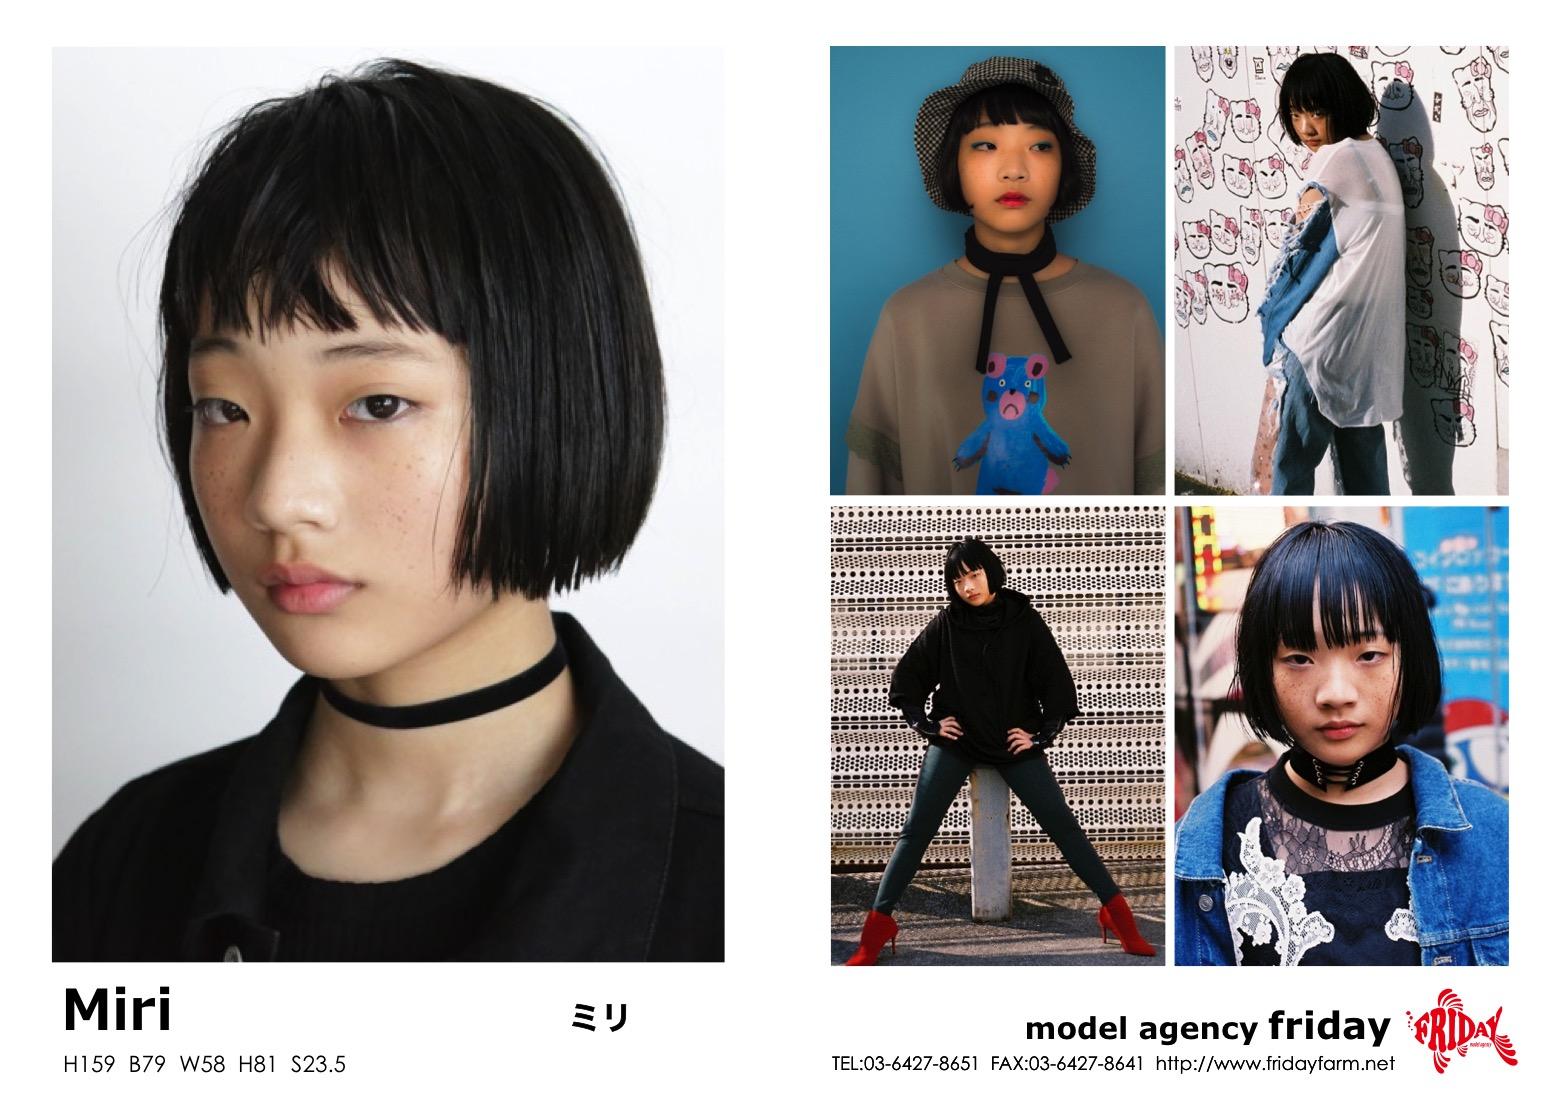 Miri - ミリ   model agency friday